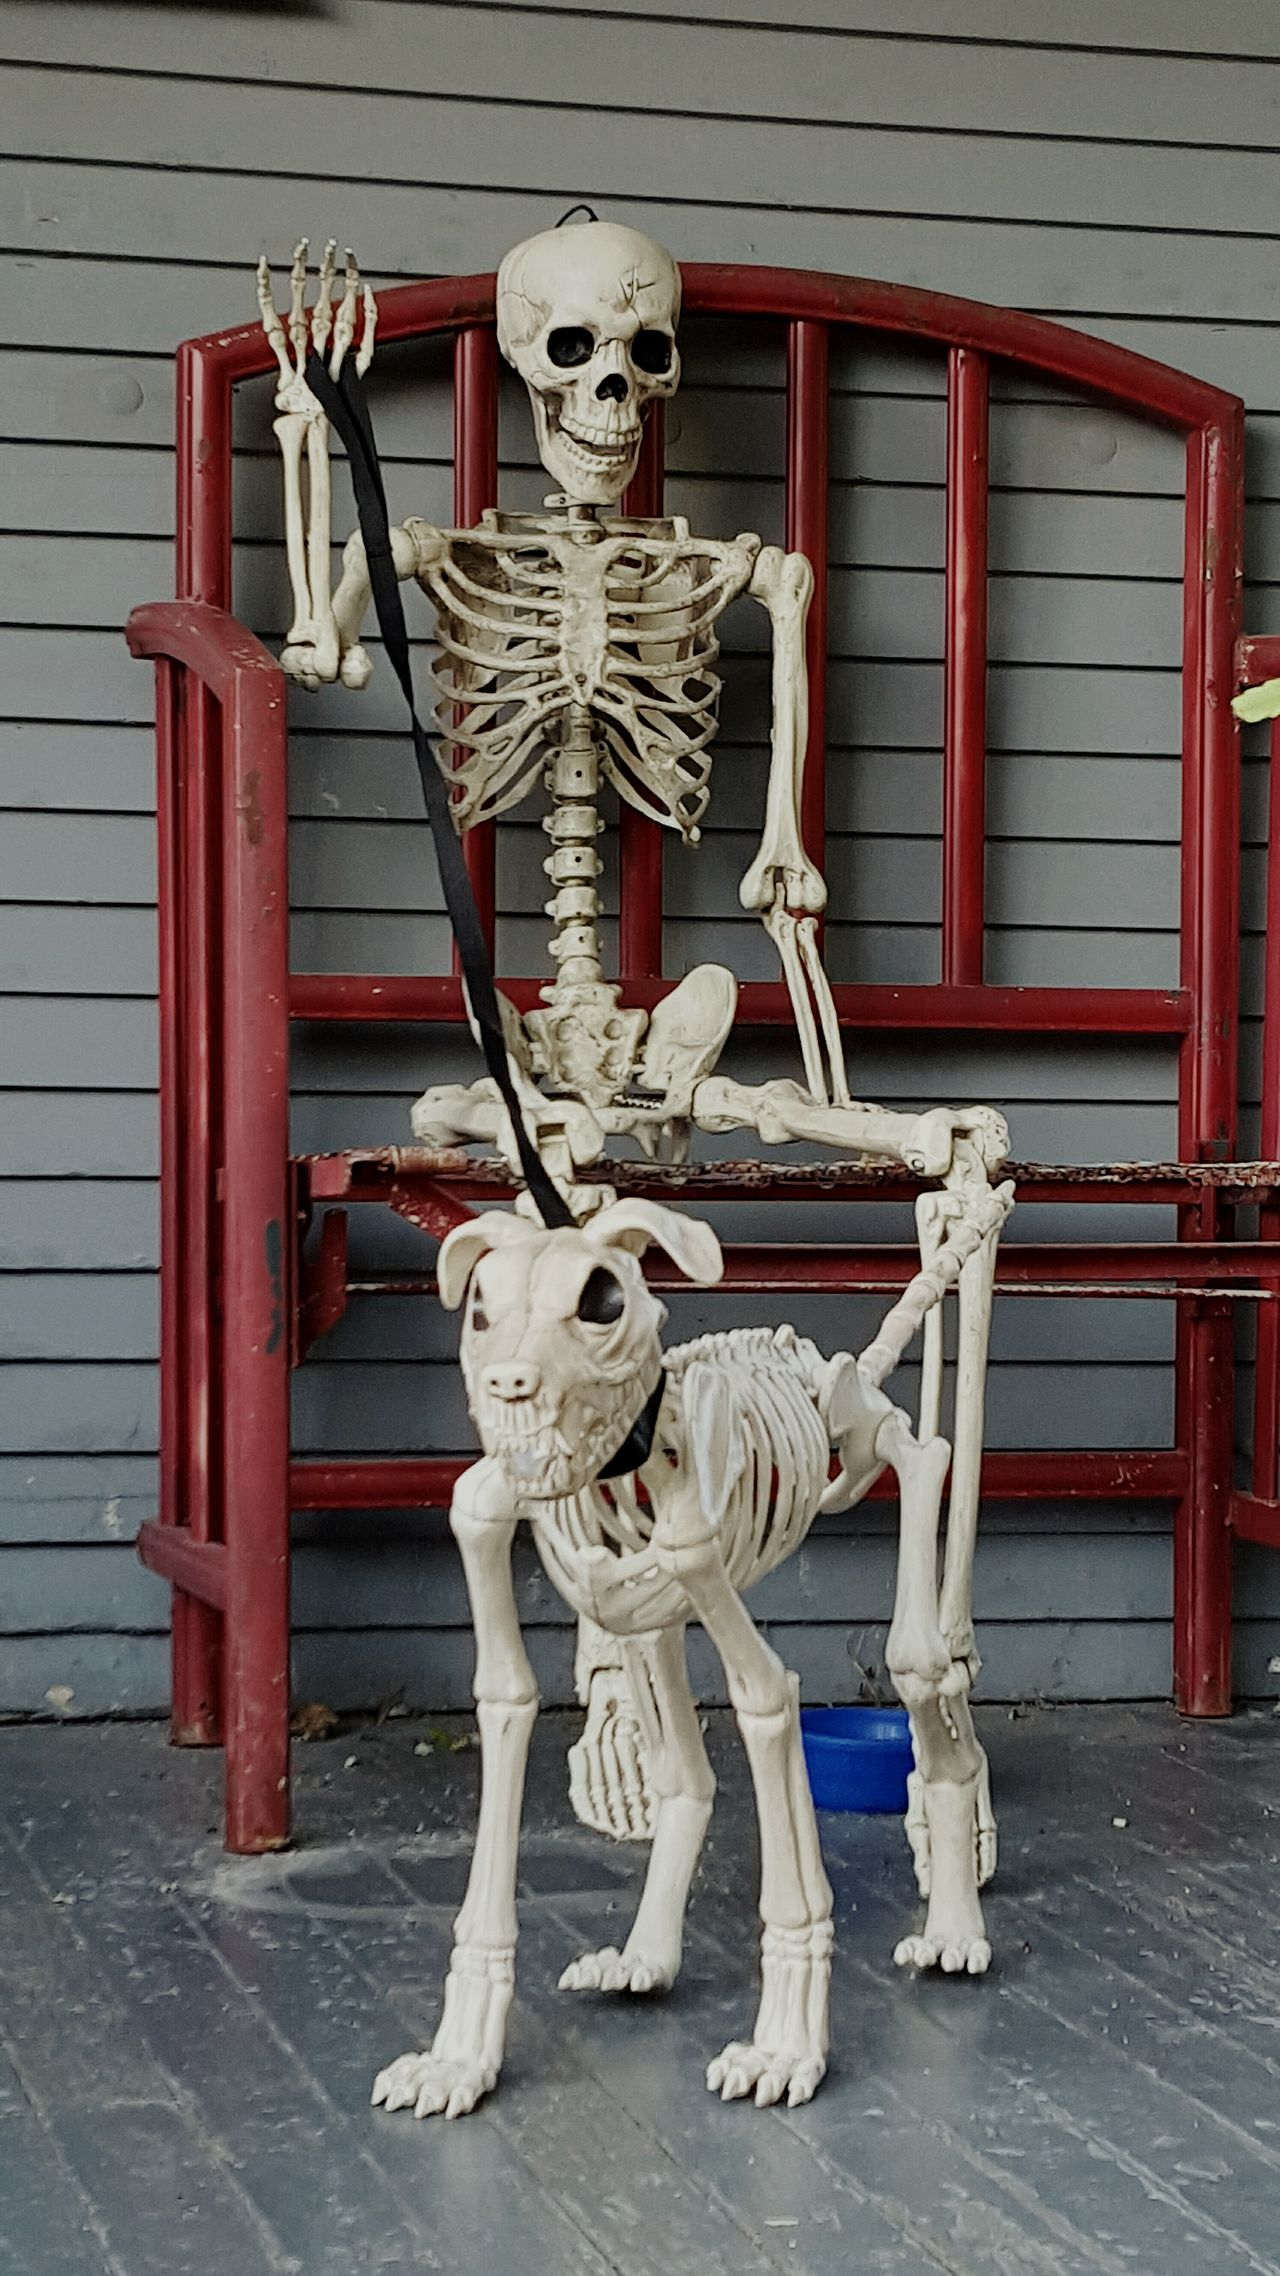 Happy Halloween Halloween EyeEm Halloween Horrors Halloween_Collection Ready For Halloween